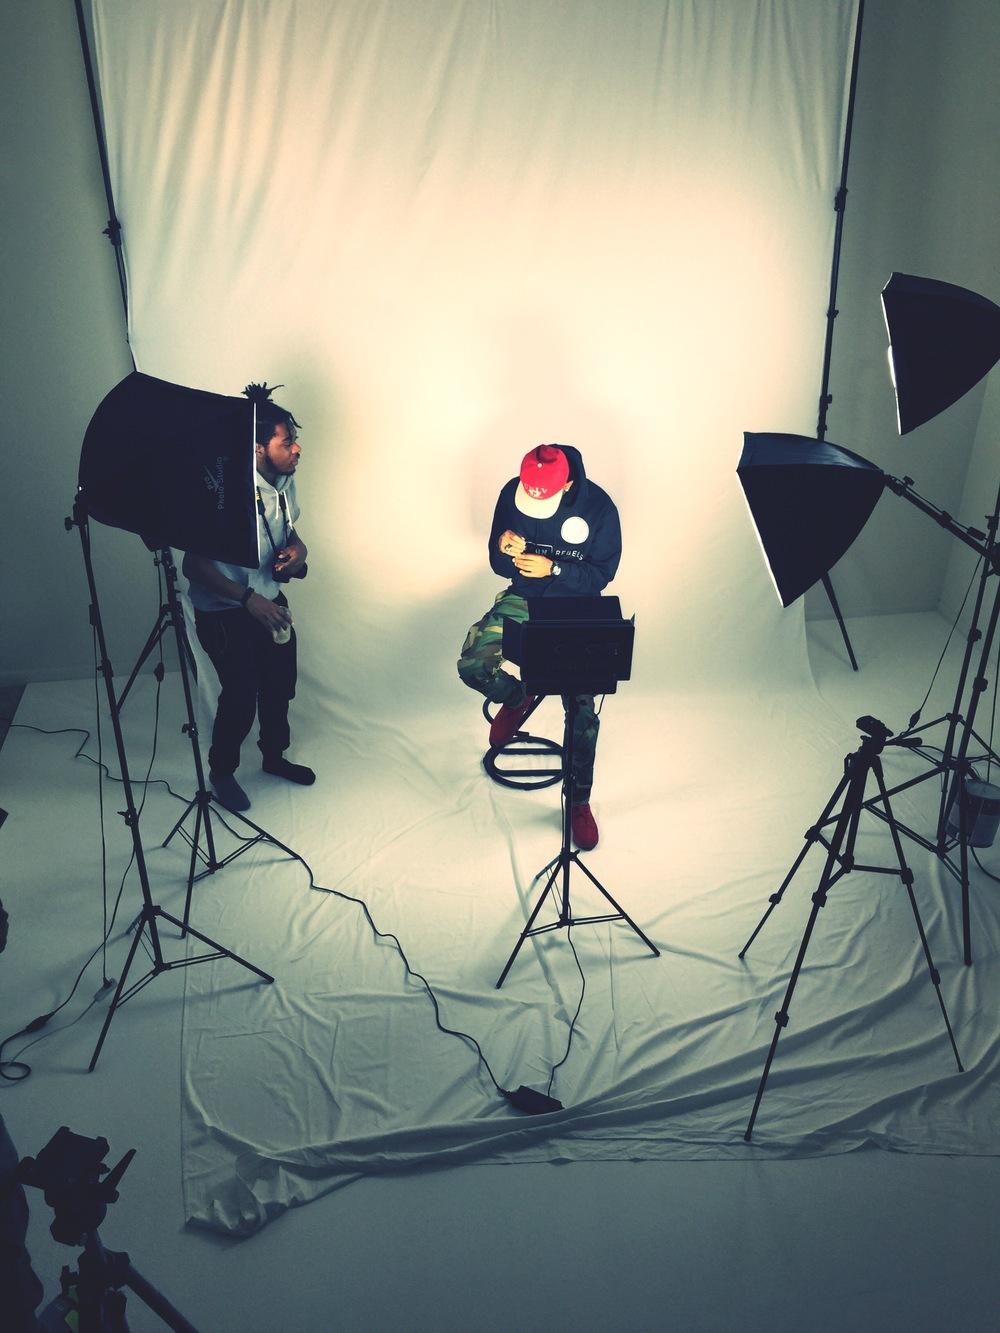 Me on set with R.E.B.E.L . Shot by Brian Burns (@bce__3)